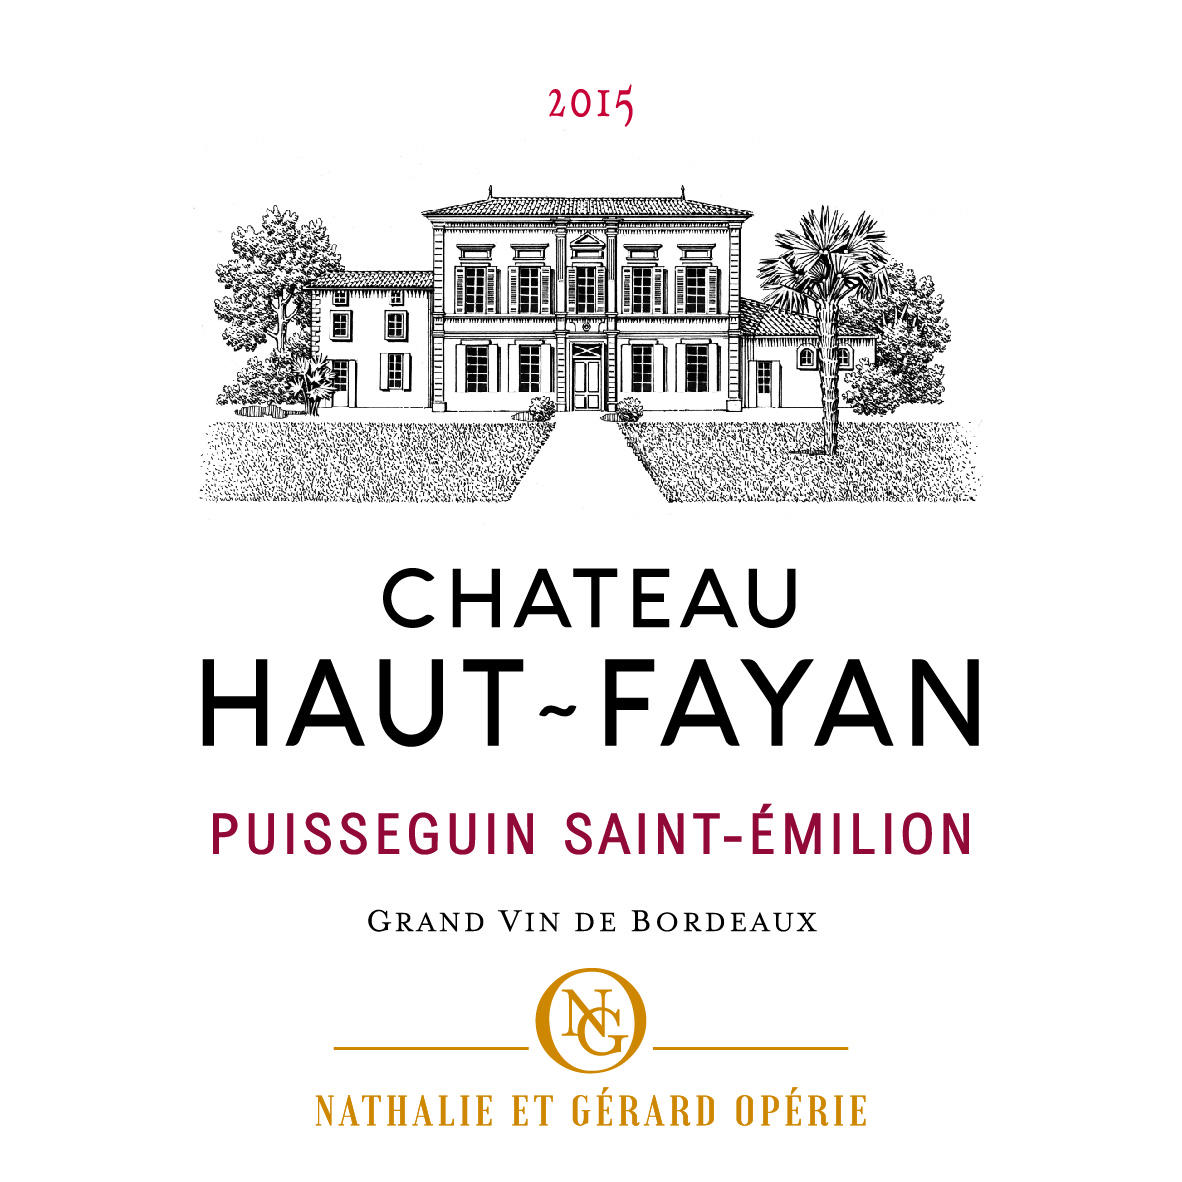 E. Haut-Fayan 2015_Plan de travail 1